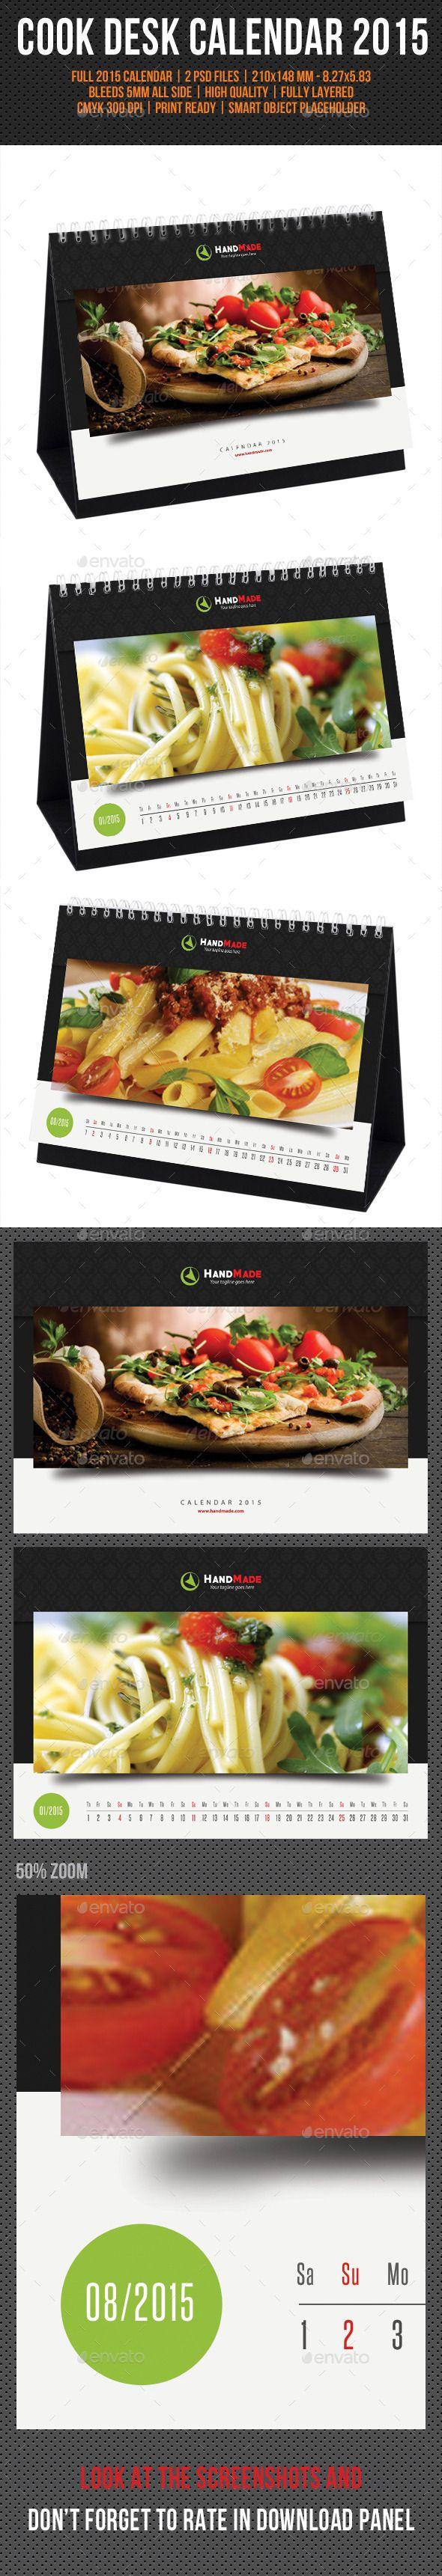 Cook And Food Desk Calendar 2015 Template | Buy and Download: http://graphicriver.net/item/cook-and-food-desk-calendar-2015-v02/9713480?ref=ksioks